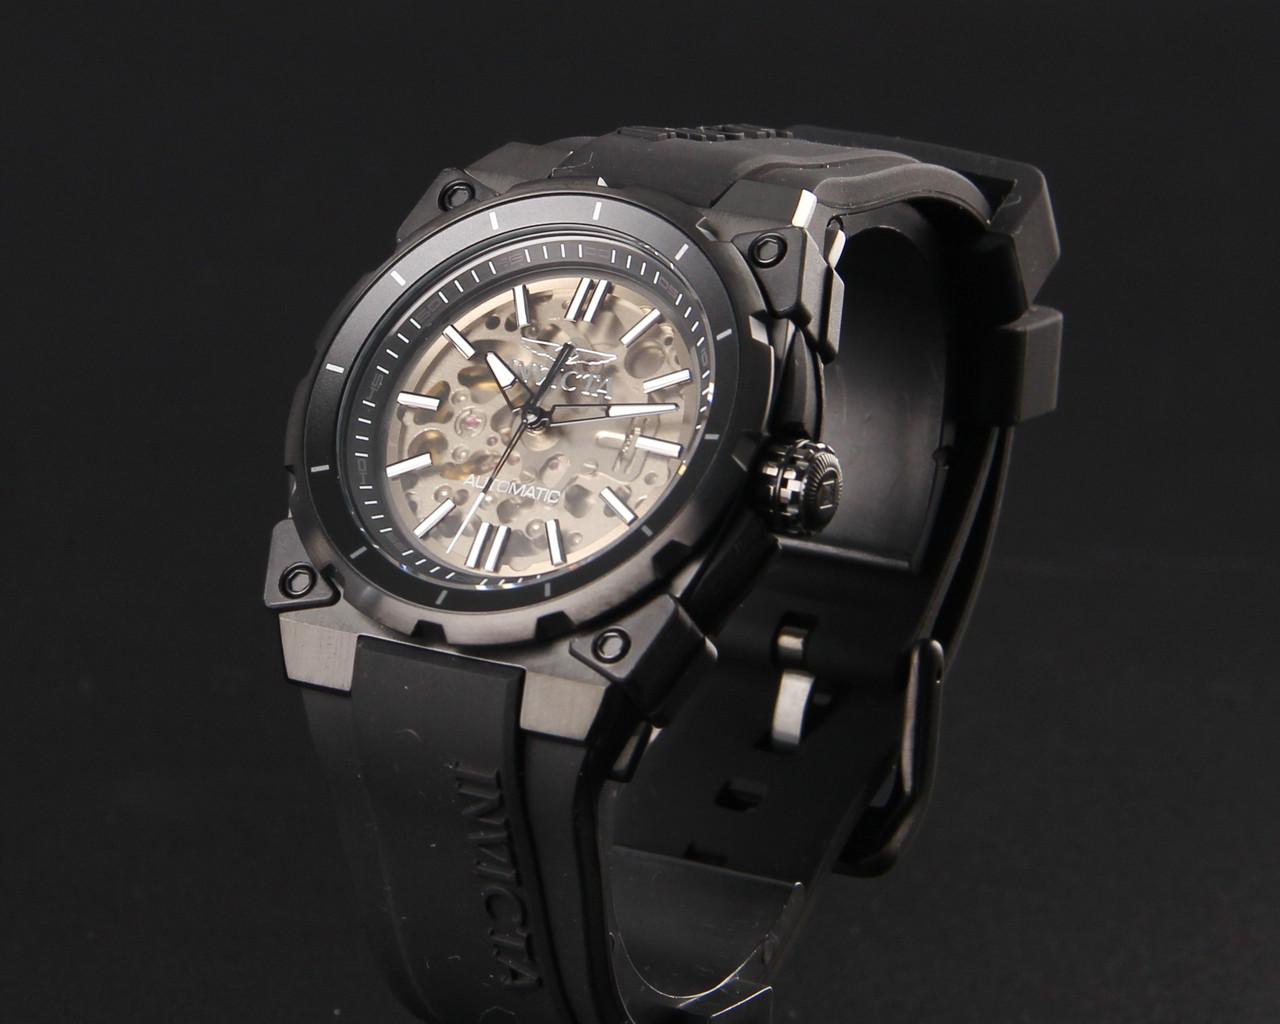 Мужские часы Invicta 27339 S1 Rally Ghost Automatic Skeleton